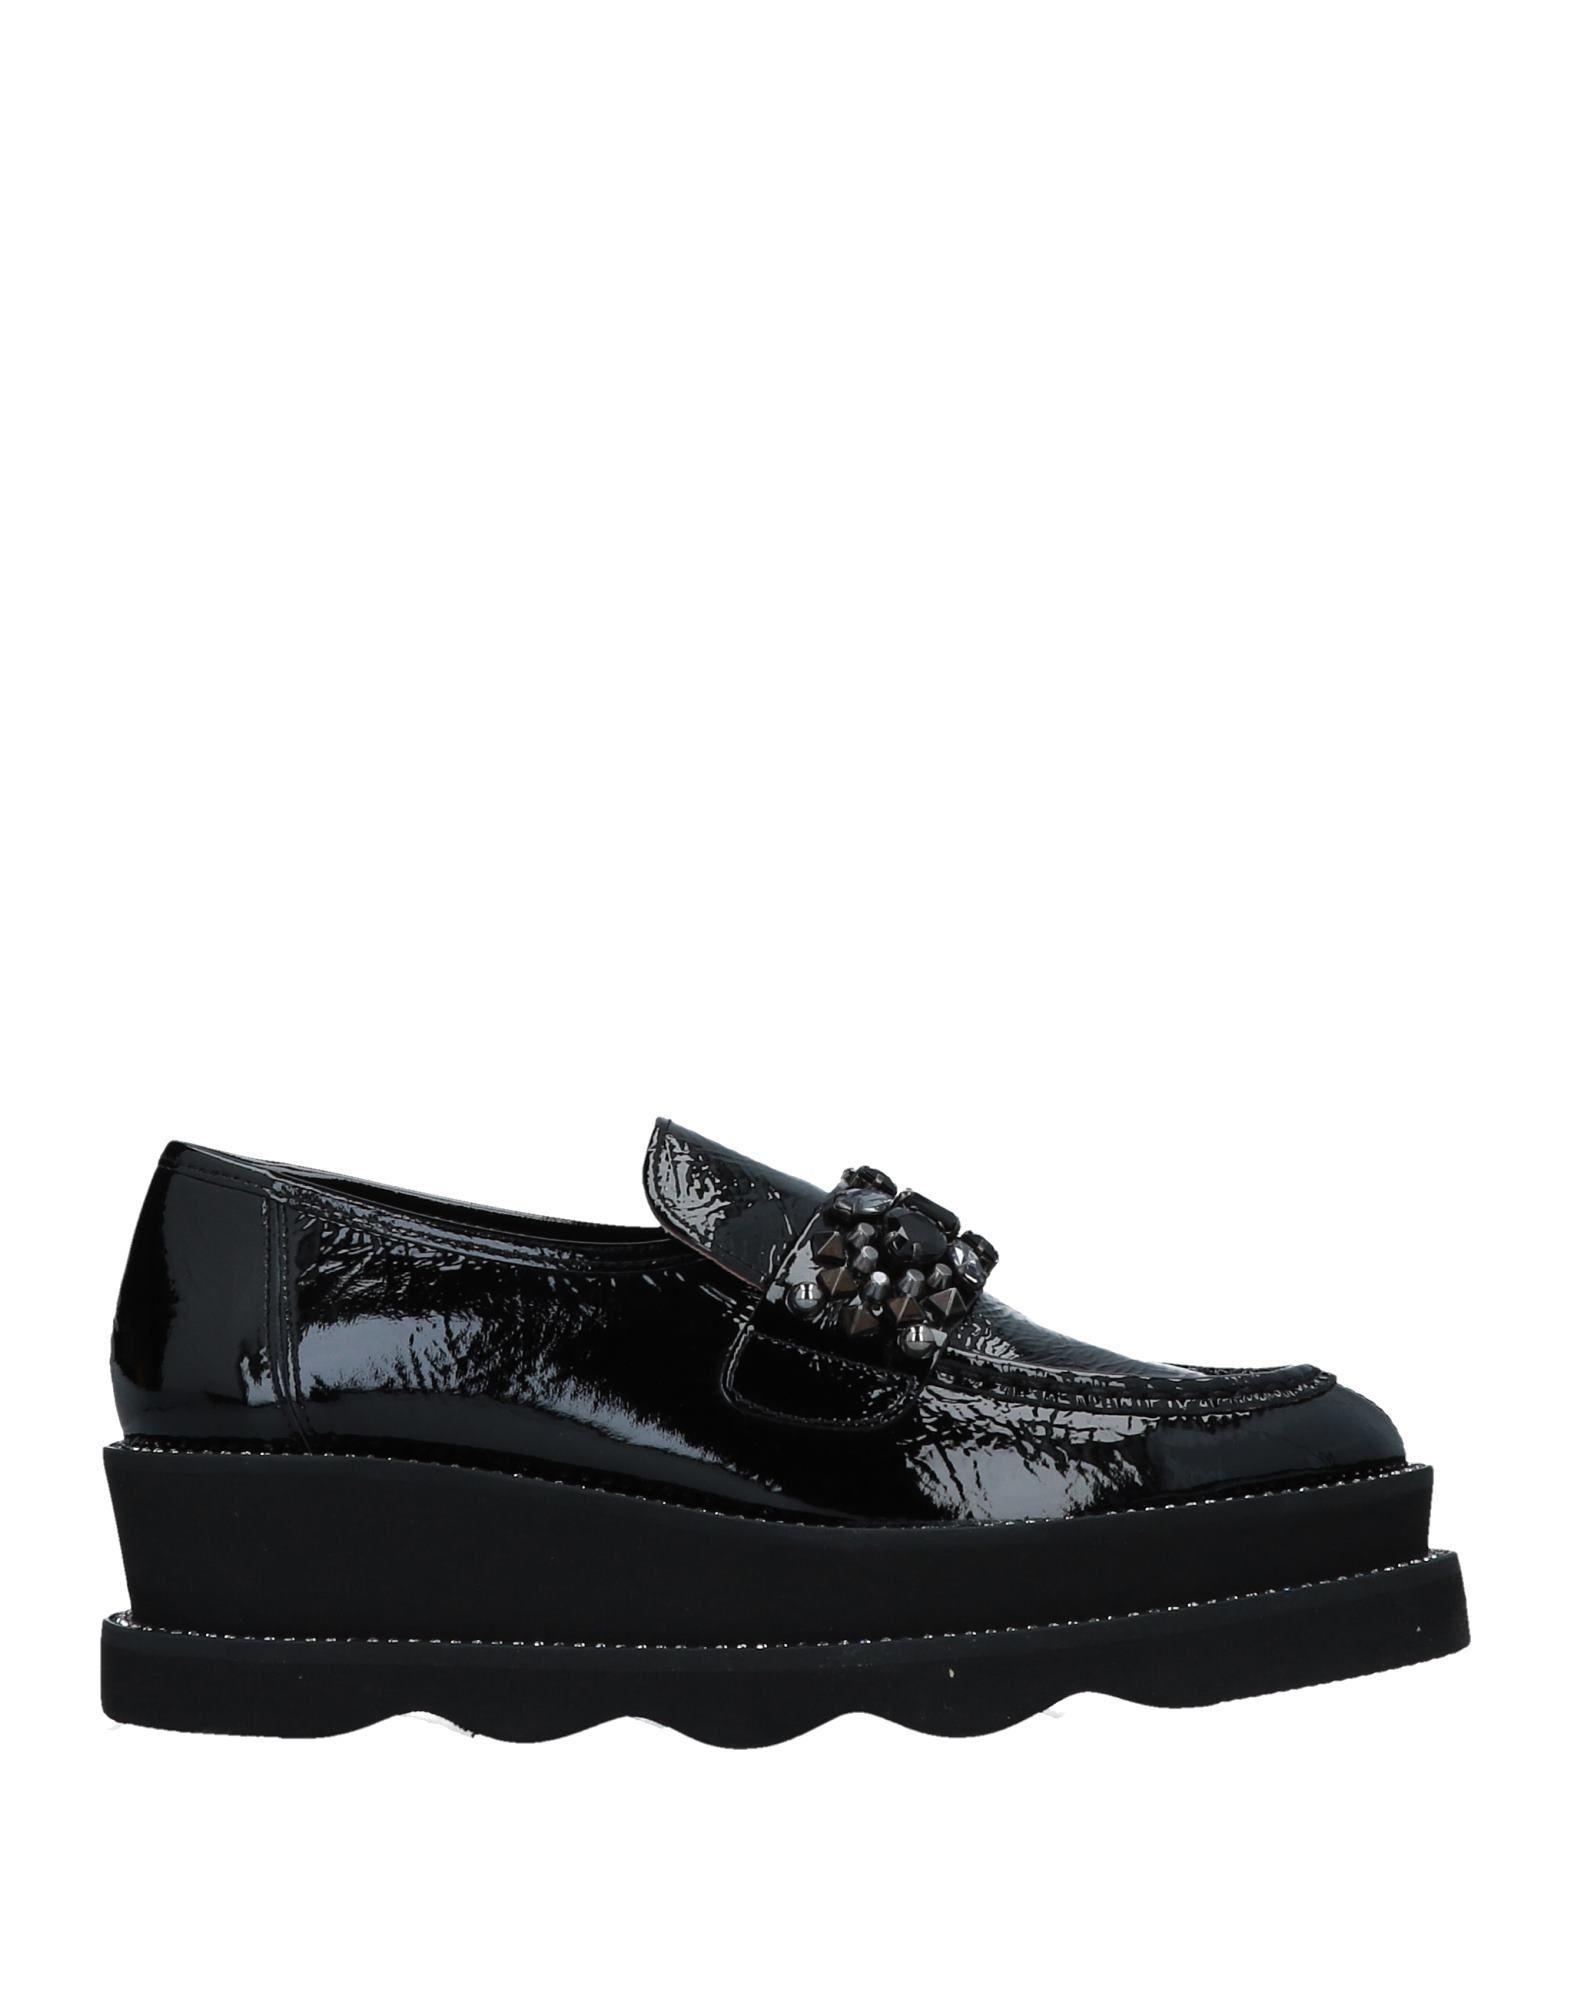 Stilvolle Damen billige Schuhe Ras Mokassins Damen Stilvolle  11511460EM b9b0dc